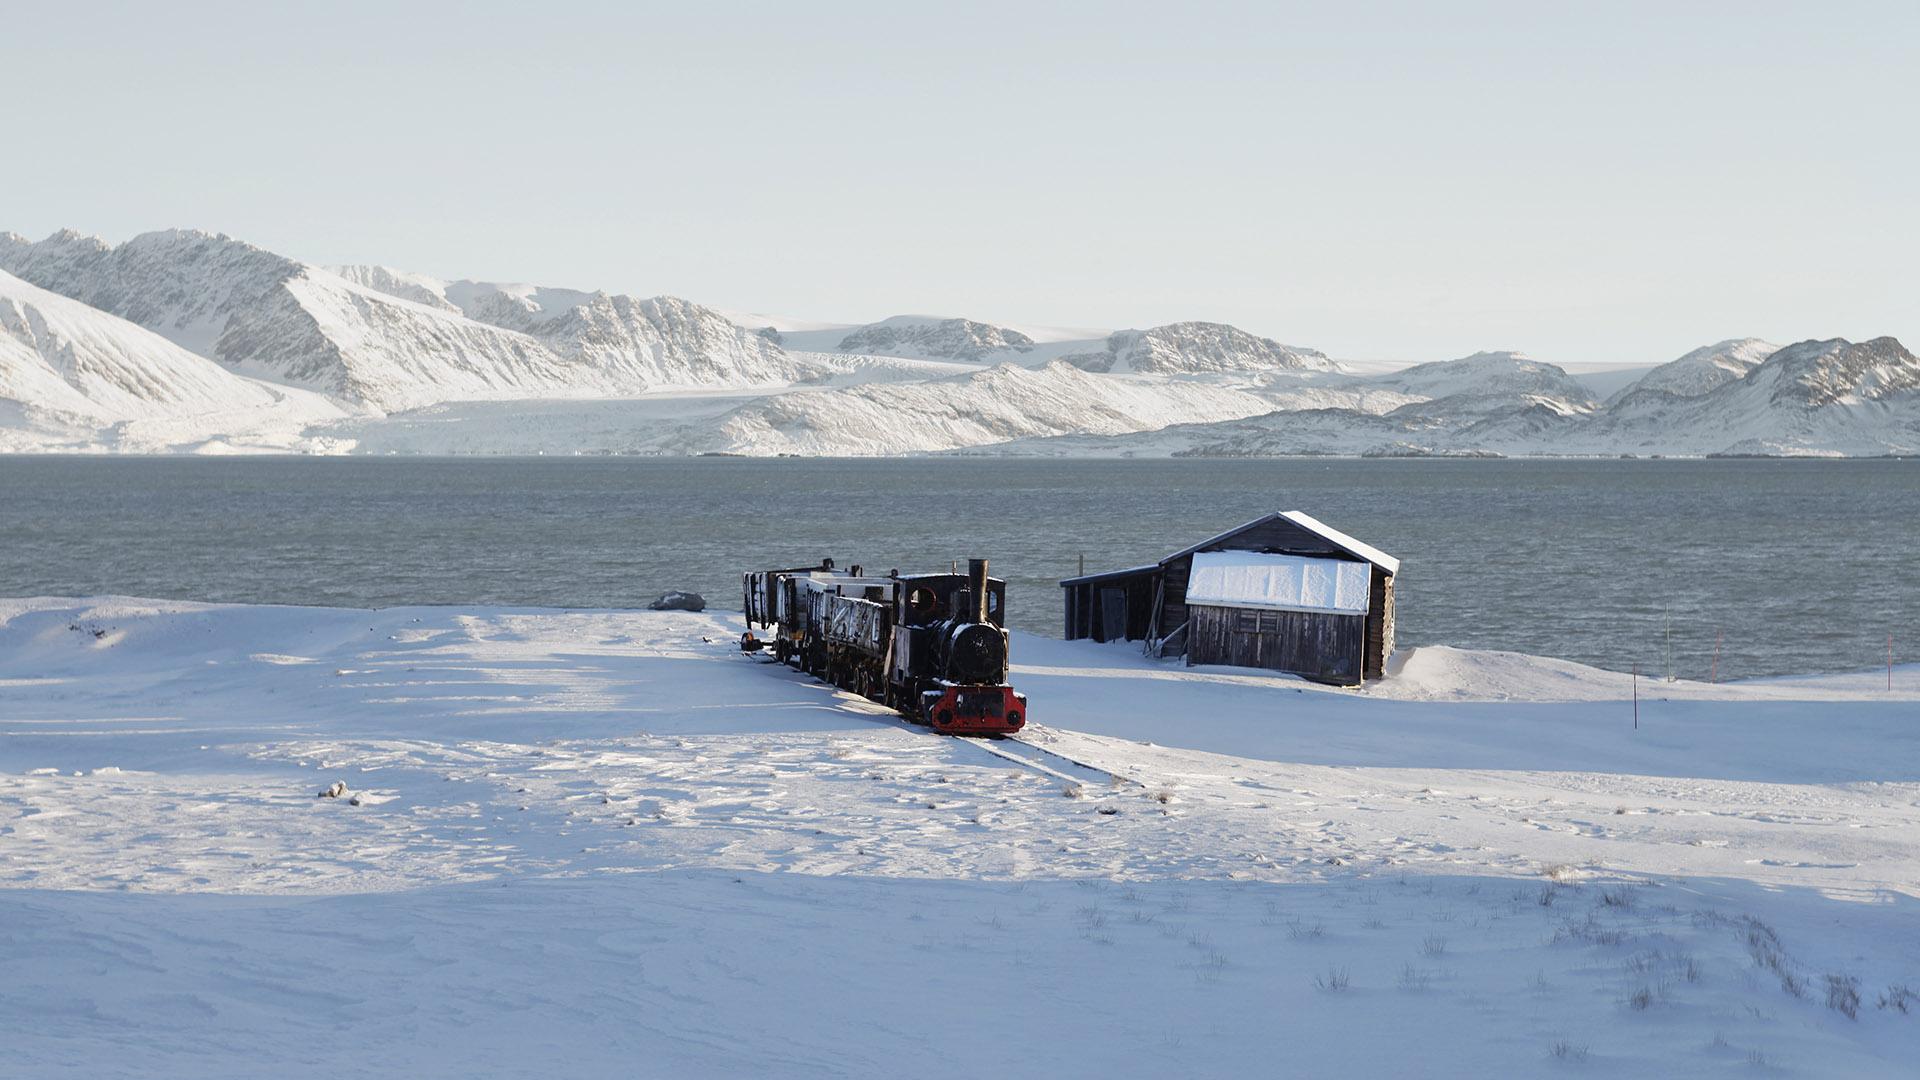 Ny-Alesund, Spitsbergen, Svalbard, 2013<br/>Impresión digital / Inject print